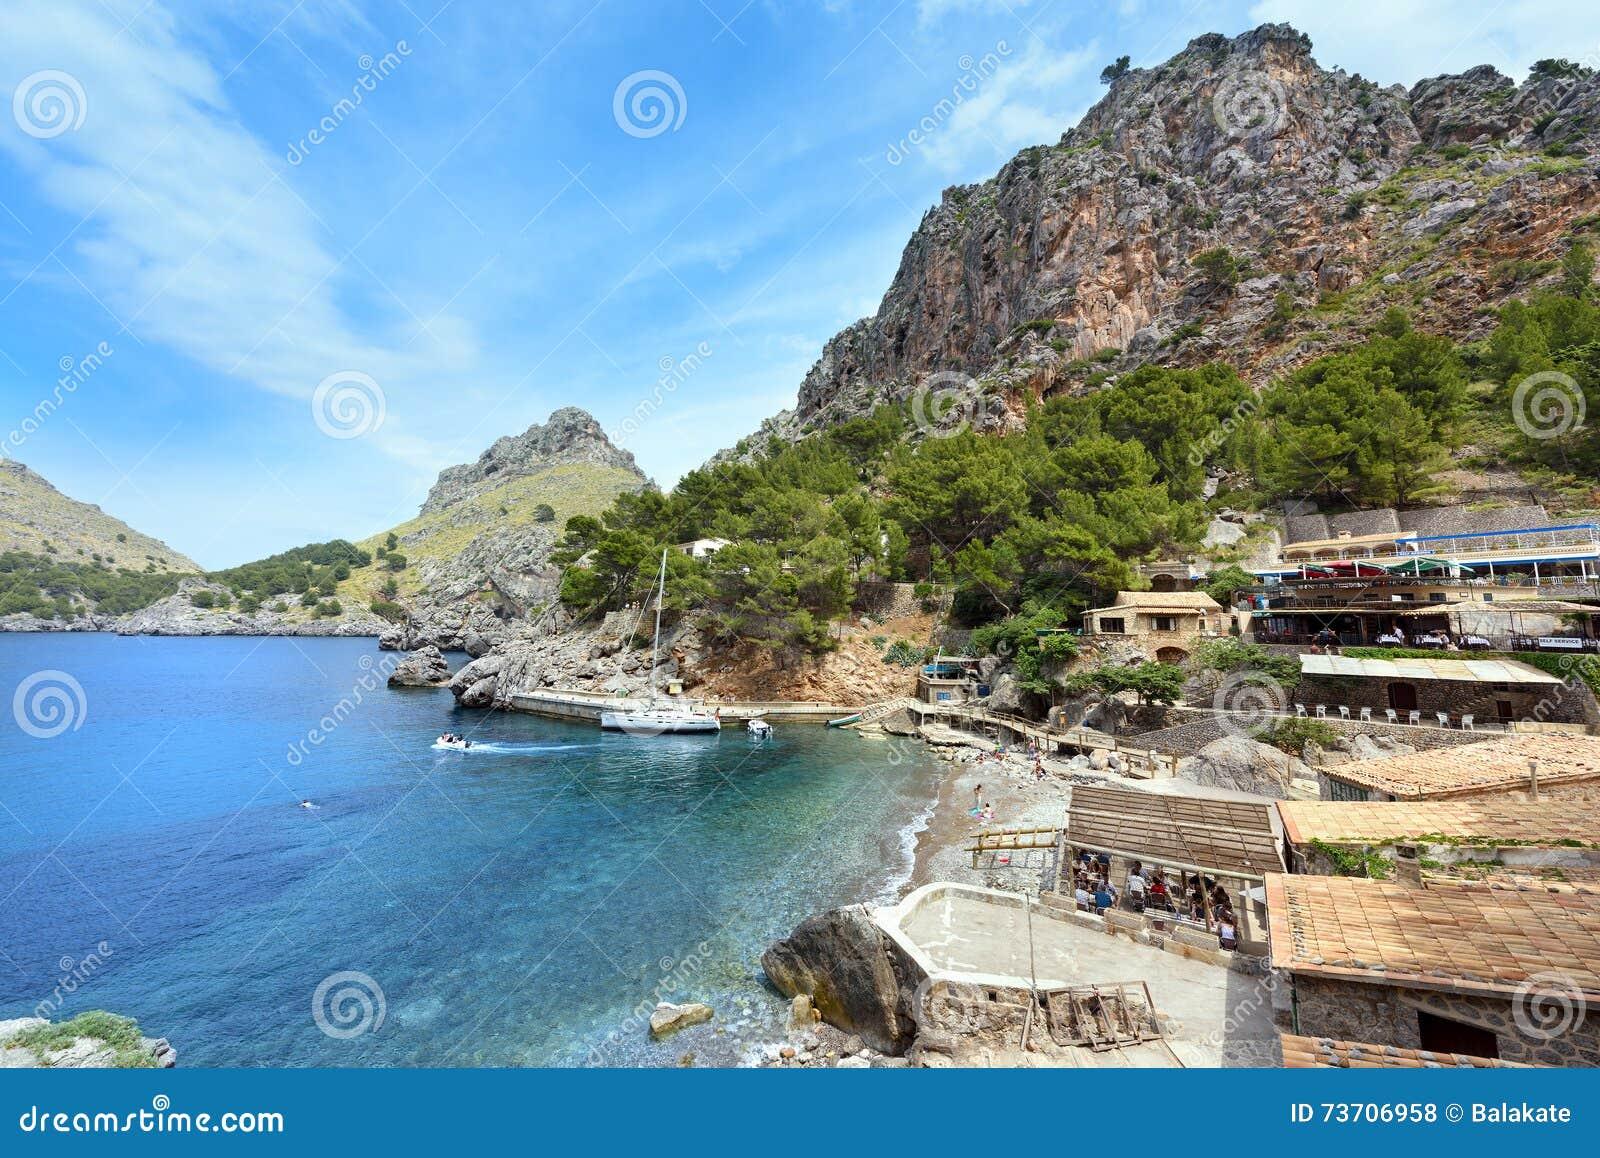 Village Sa Calobra on the coast of the Mediterranean sea. Island Majorca, Spain.